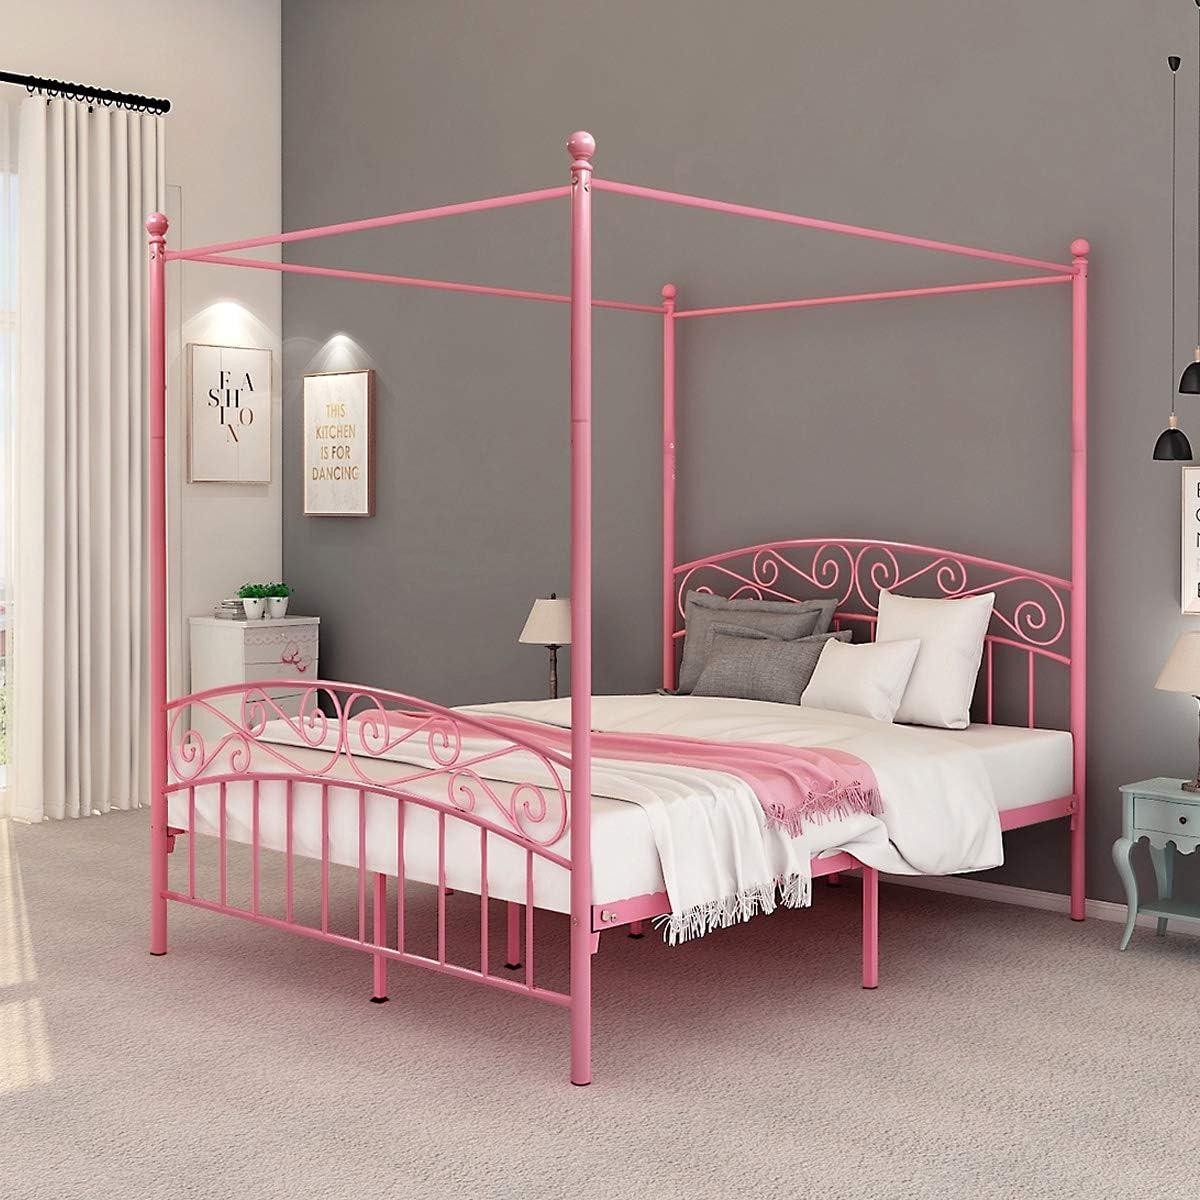 Amazon Com Dumee Queen Size Metal Canopy Bed Frame Platform Sweet